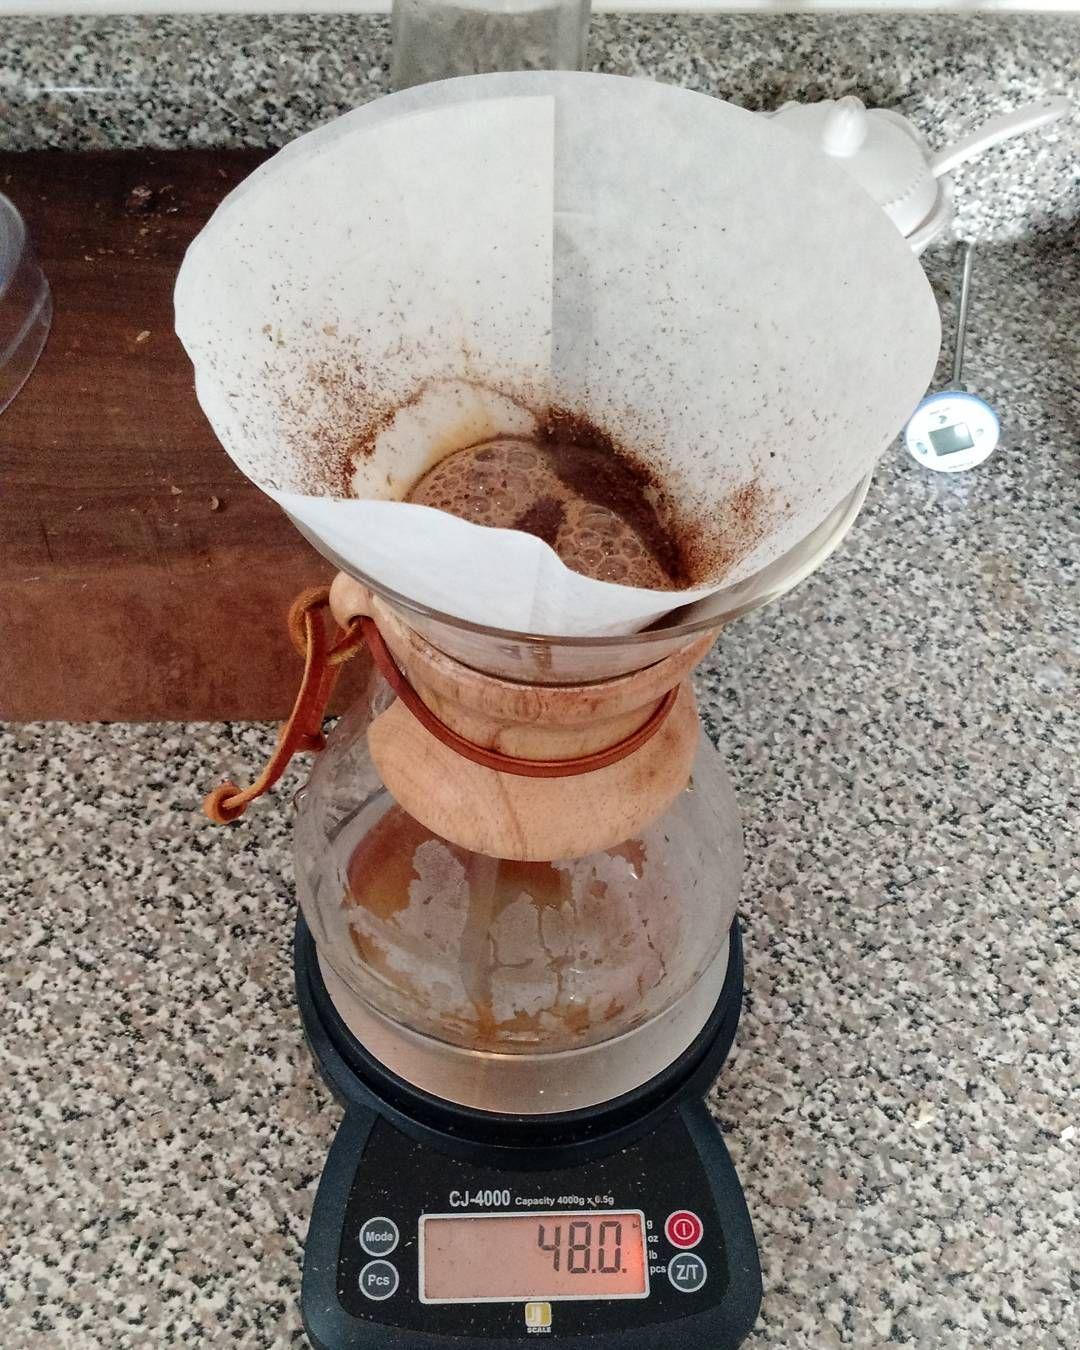 Coffee makes the world go round. And around forever. #coffee #chemex #mornjnf #breakfast #caffeine by kristianhansen